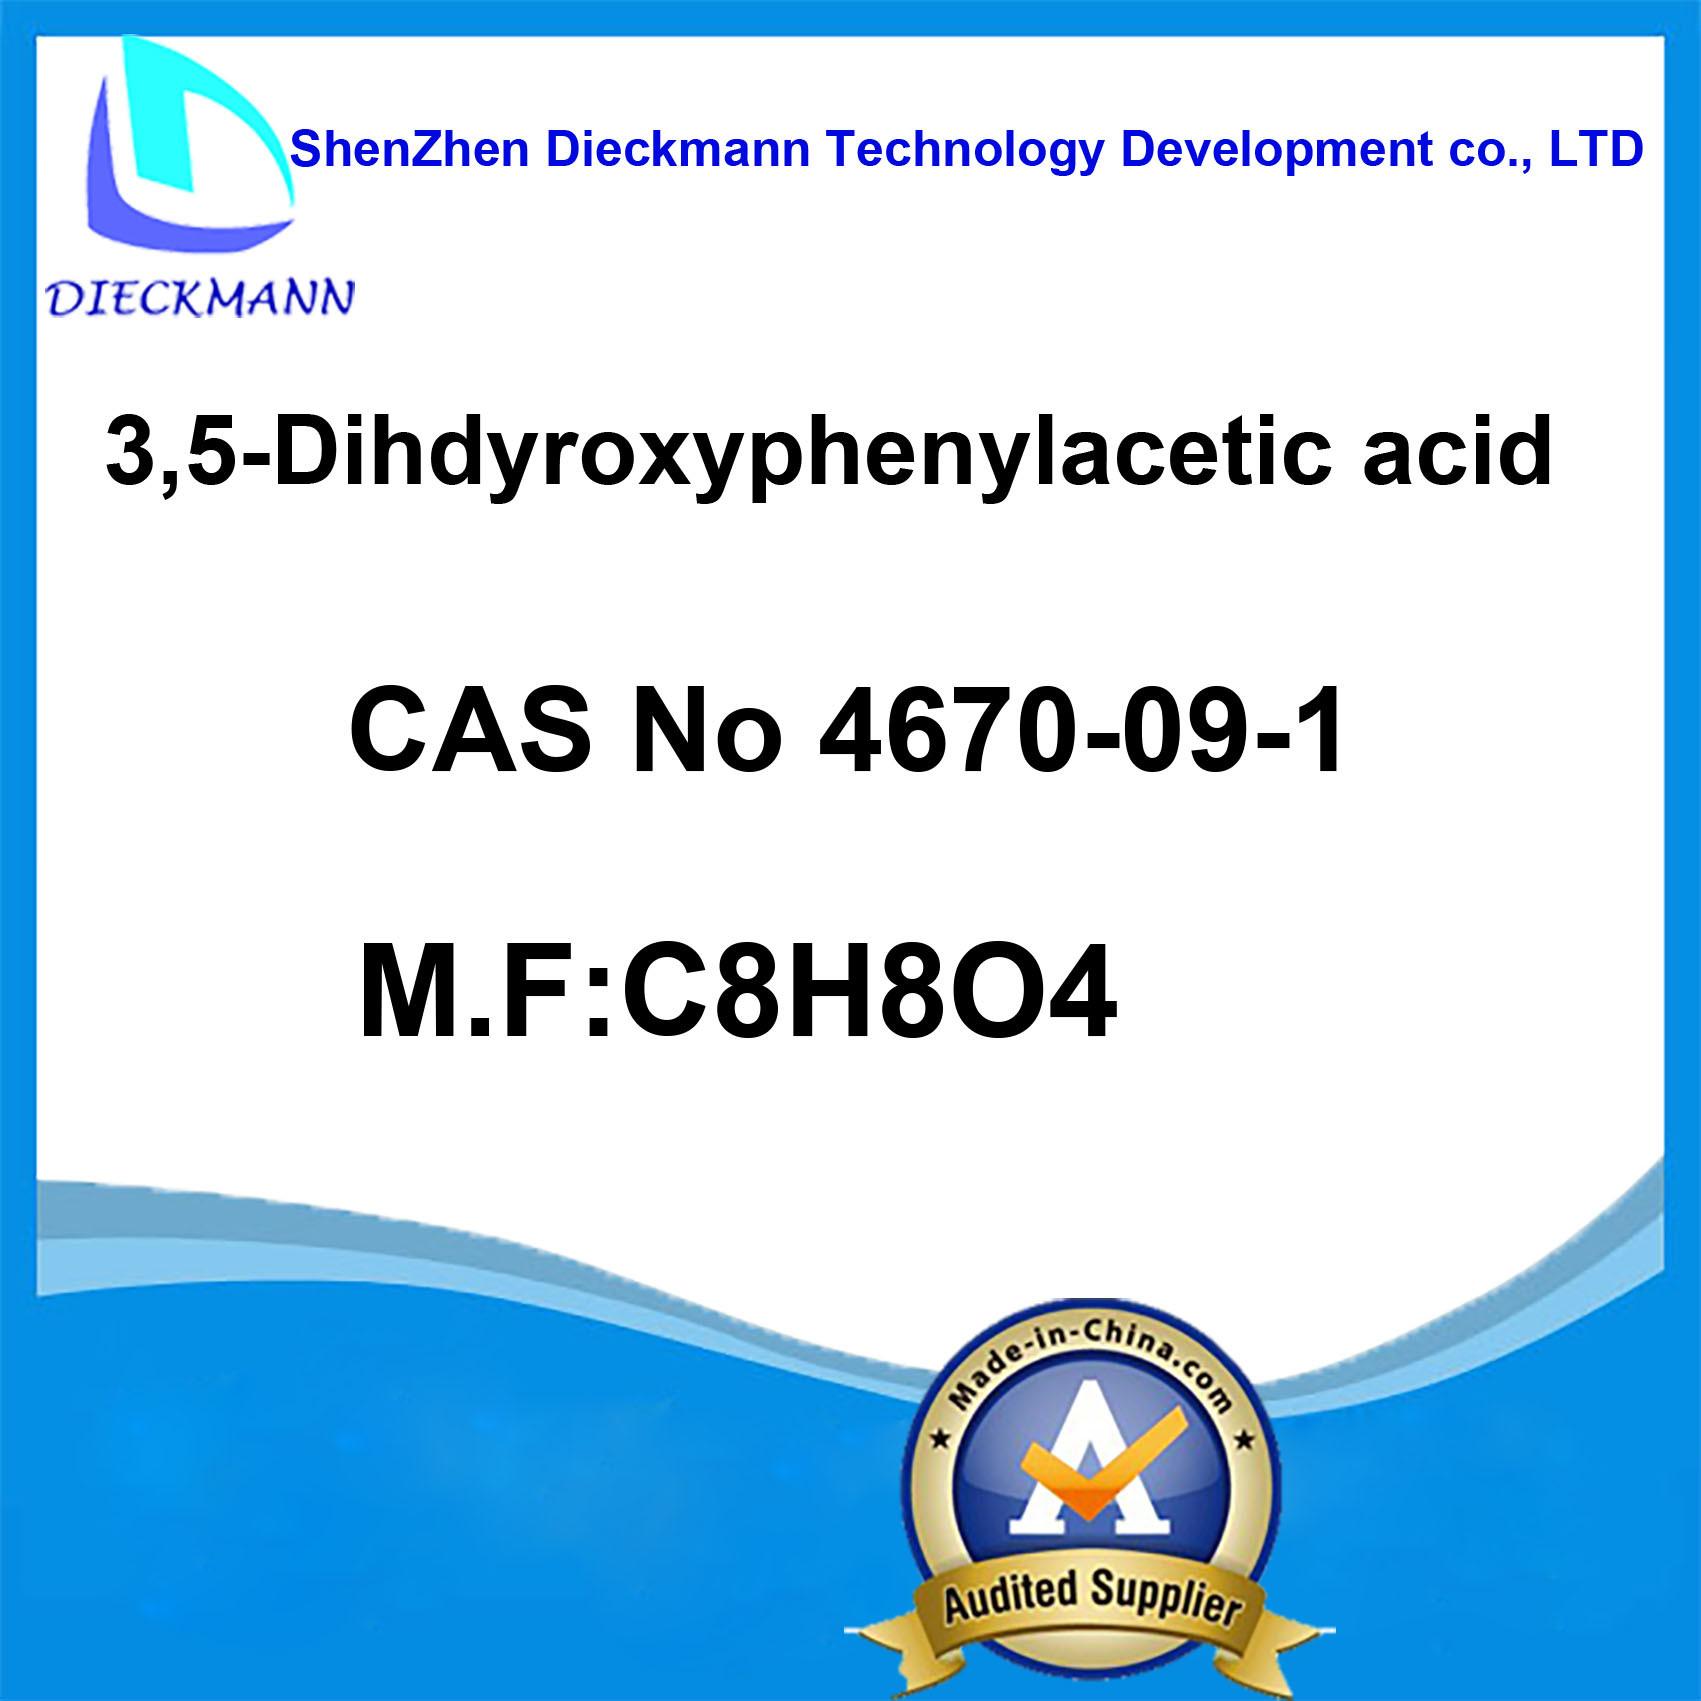 3, 5-Dihdyroxyphenylacetic Acid CAS No 4670-09-1